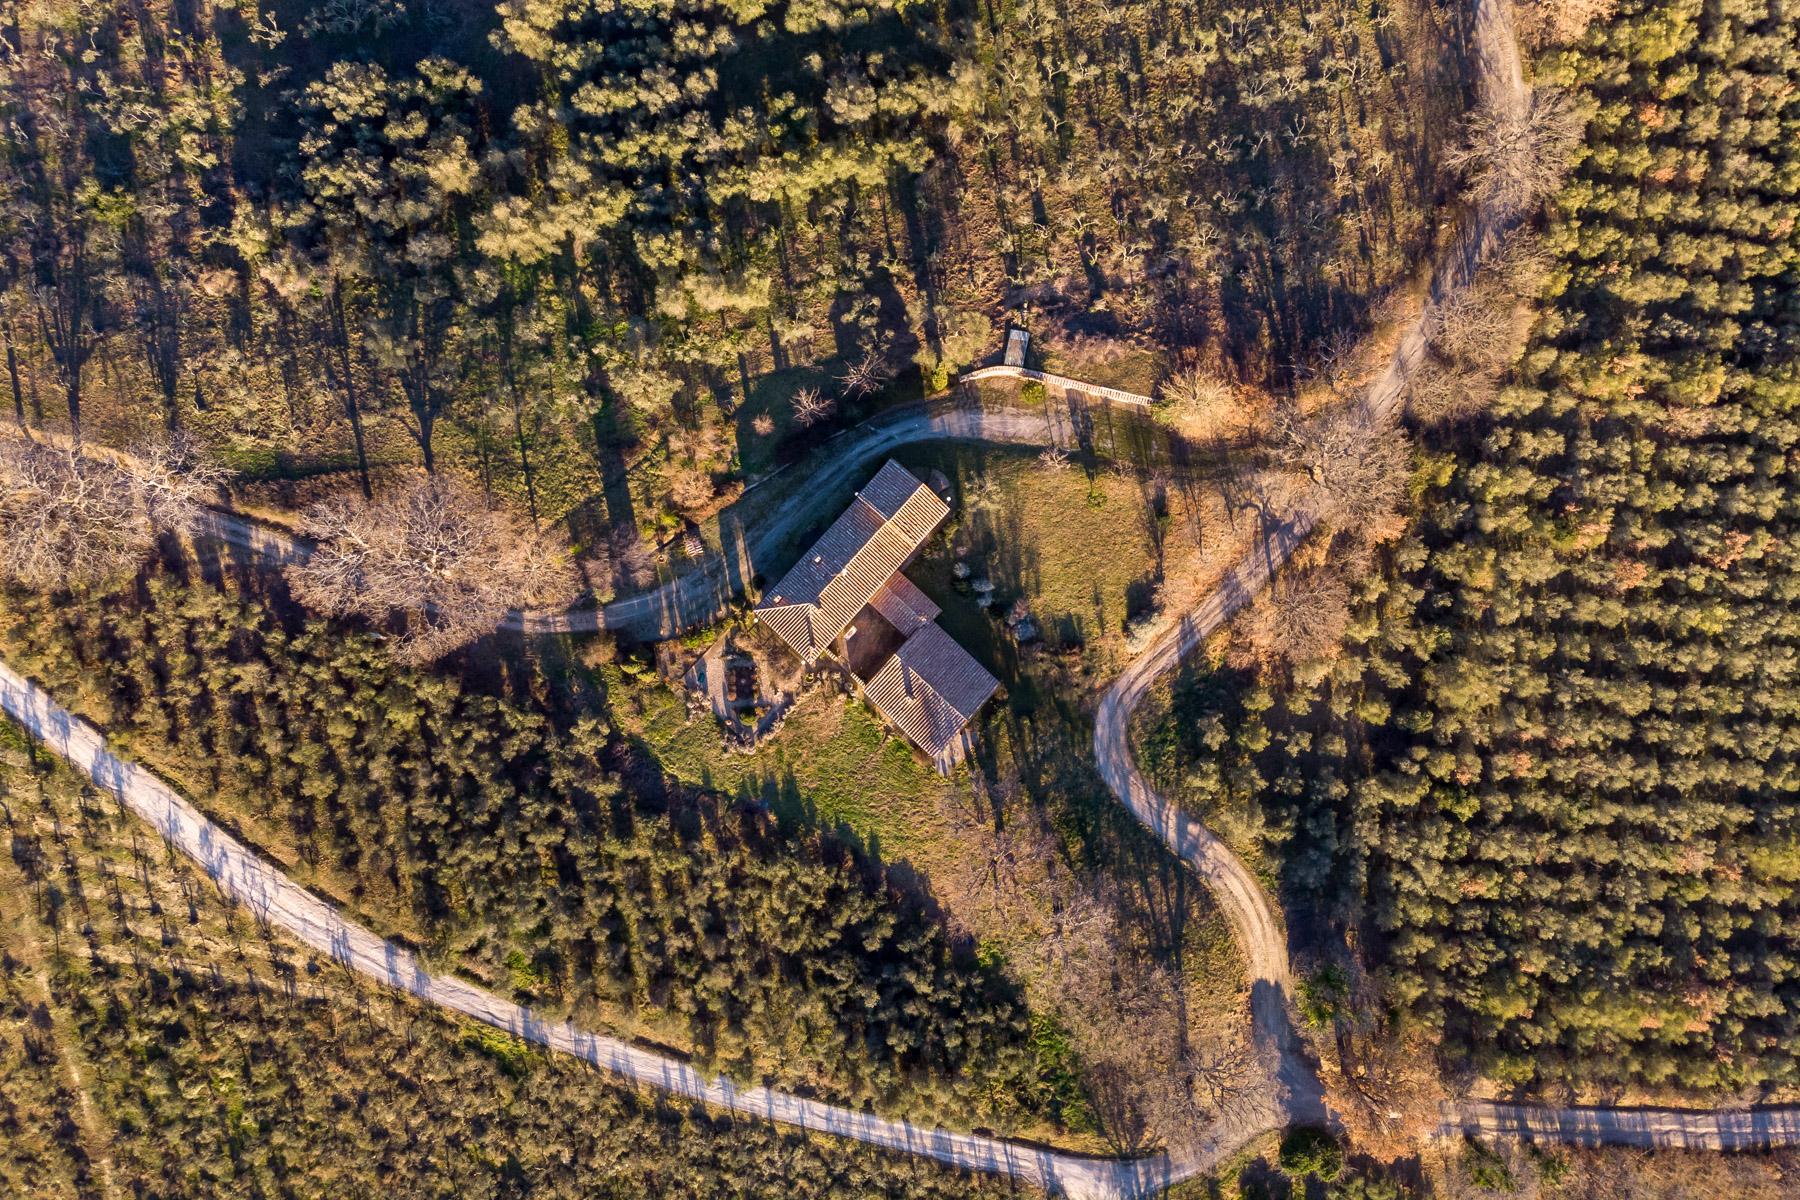 Casa indipendente in Vendita a Pienza: 5 locali, 400 mq - Foto 3